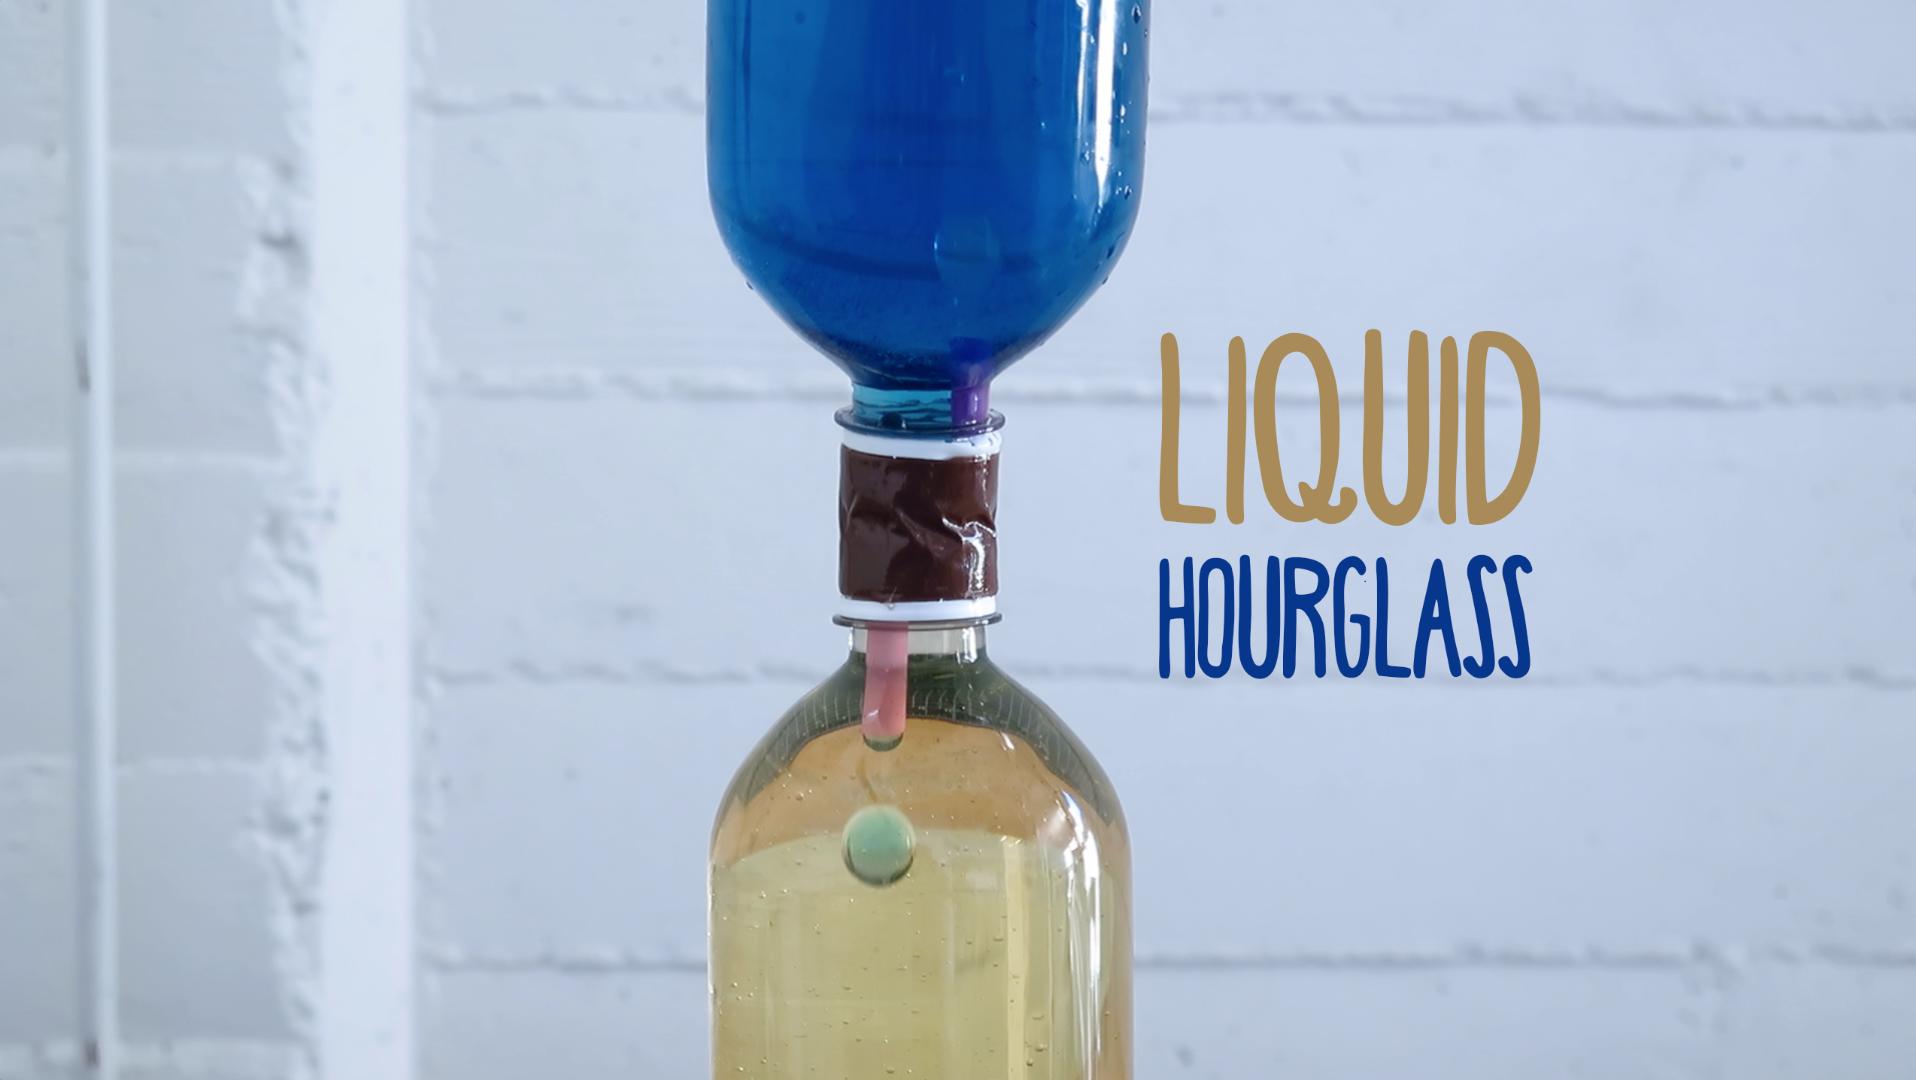 Picture of Liquid Hourglass